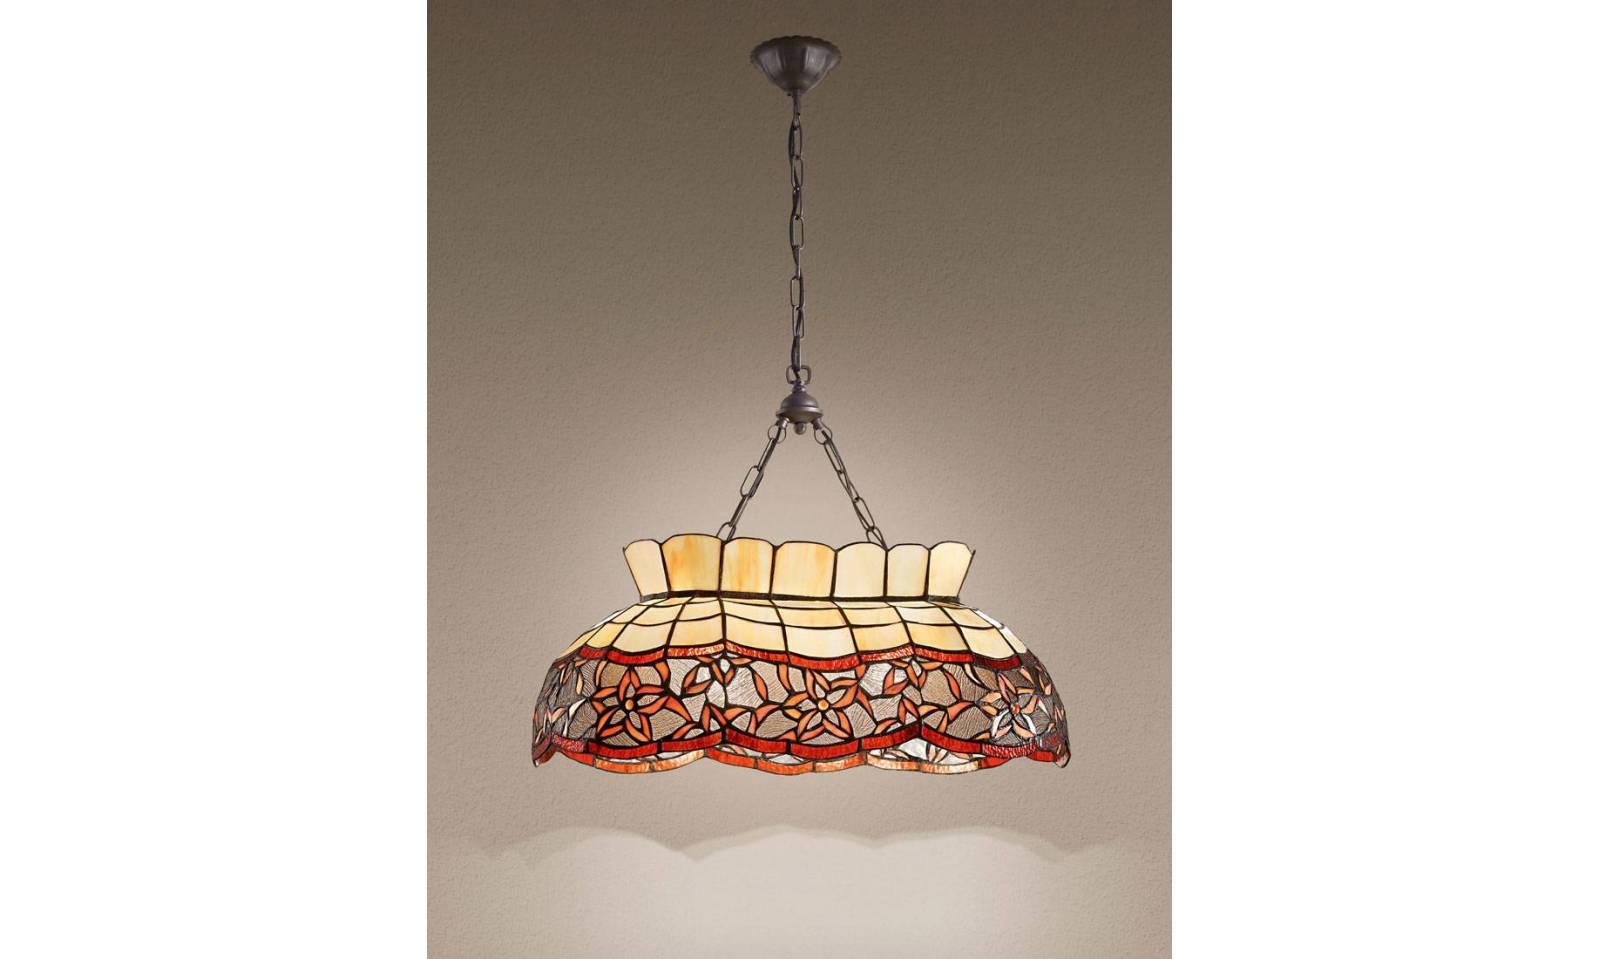 Plafoniere Tiffany : Perenz tiffany rustic suspension lamp t 967 s